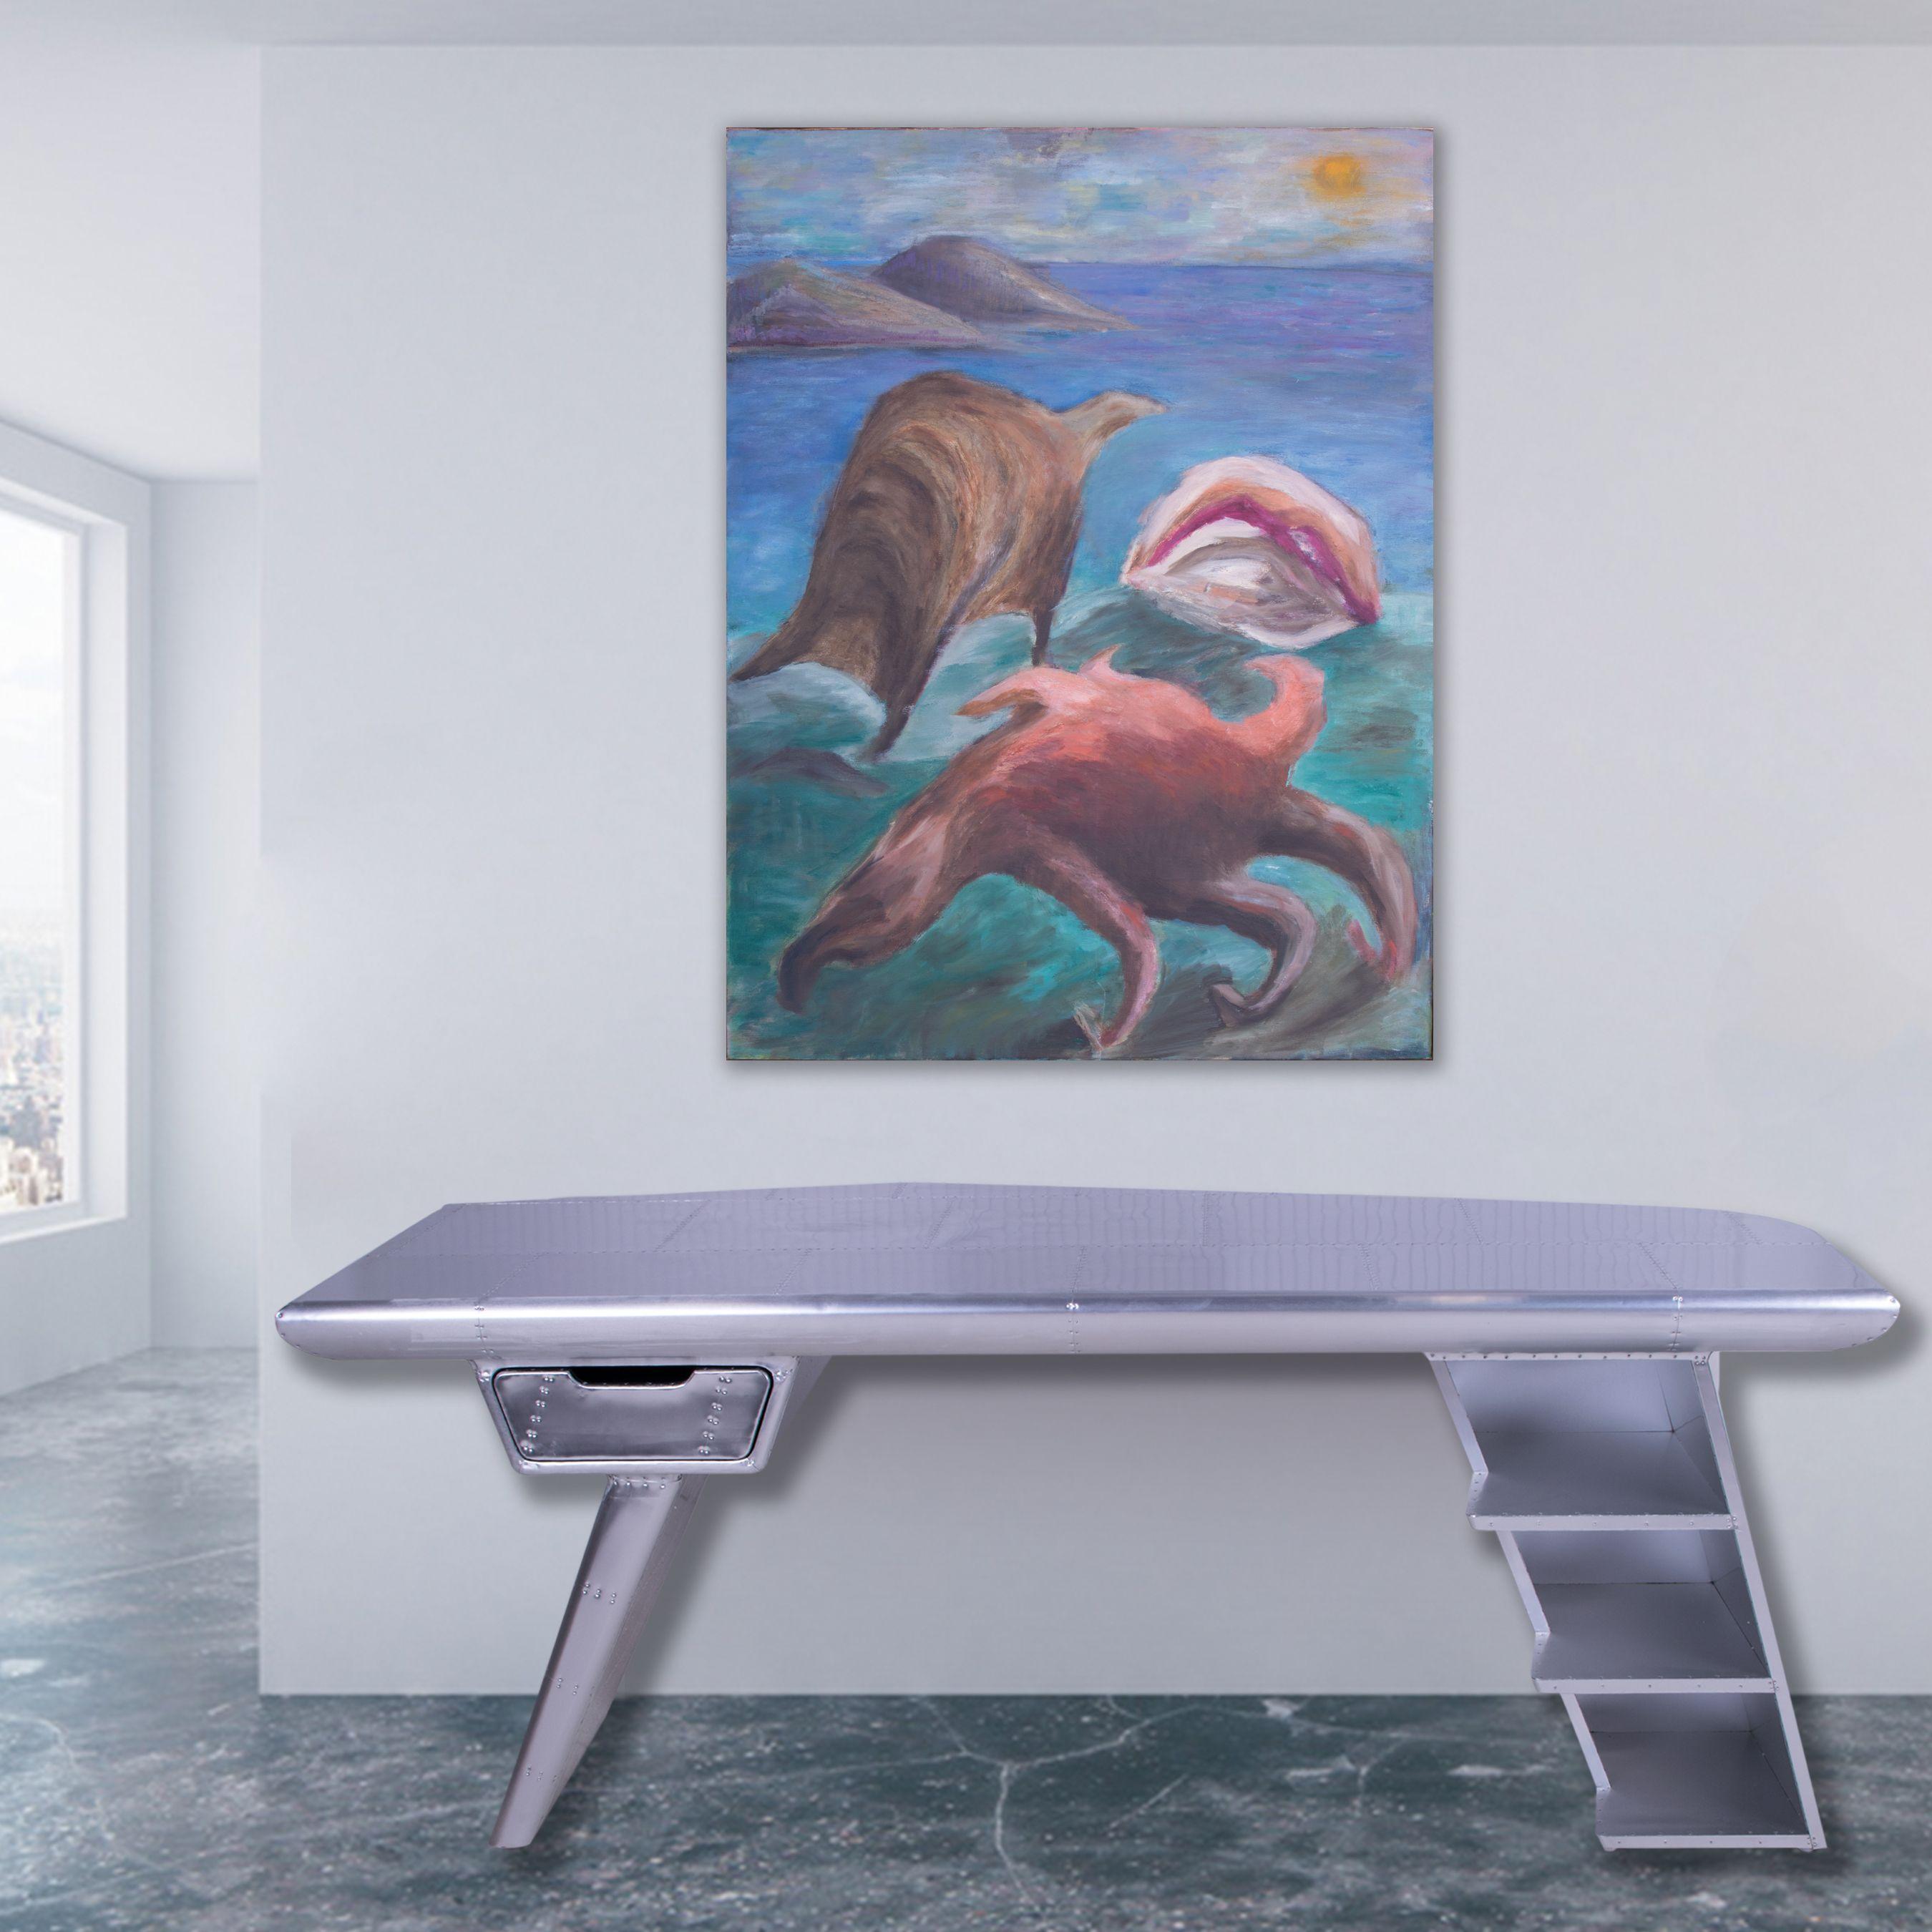 Modern metal hammered desk & modern art sold at Abell Auction Co of